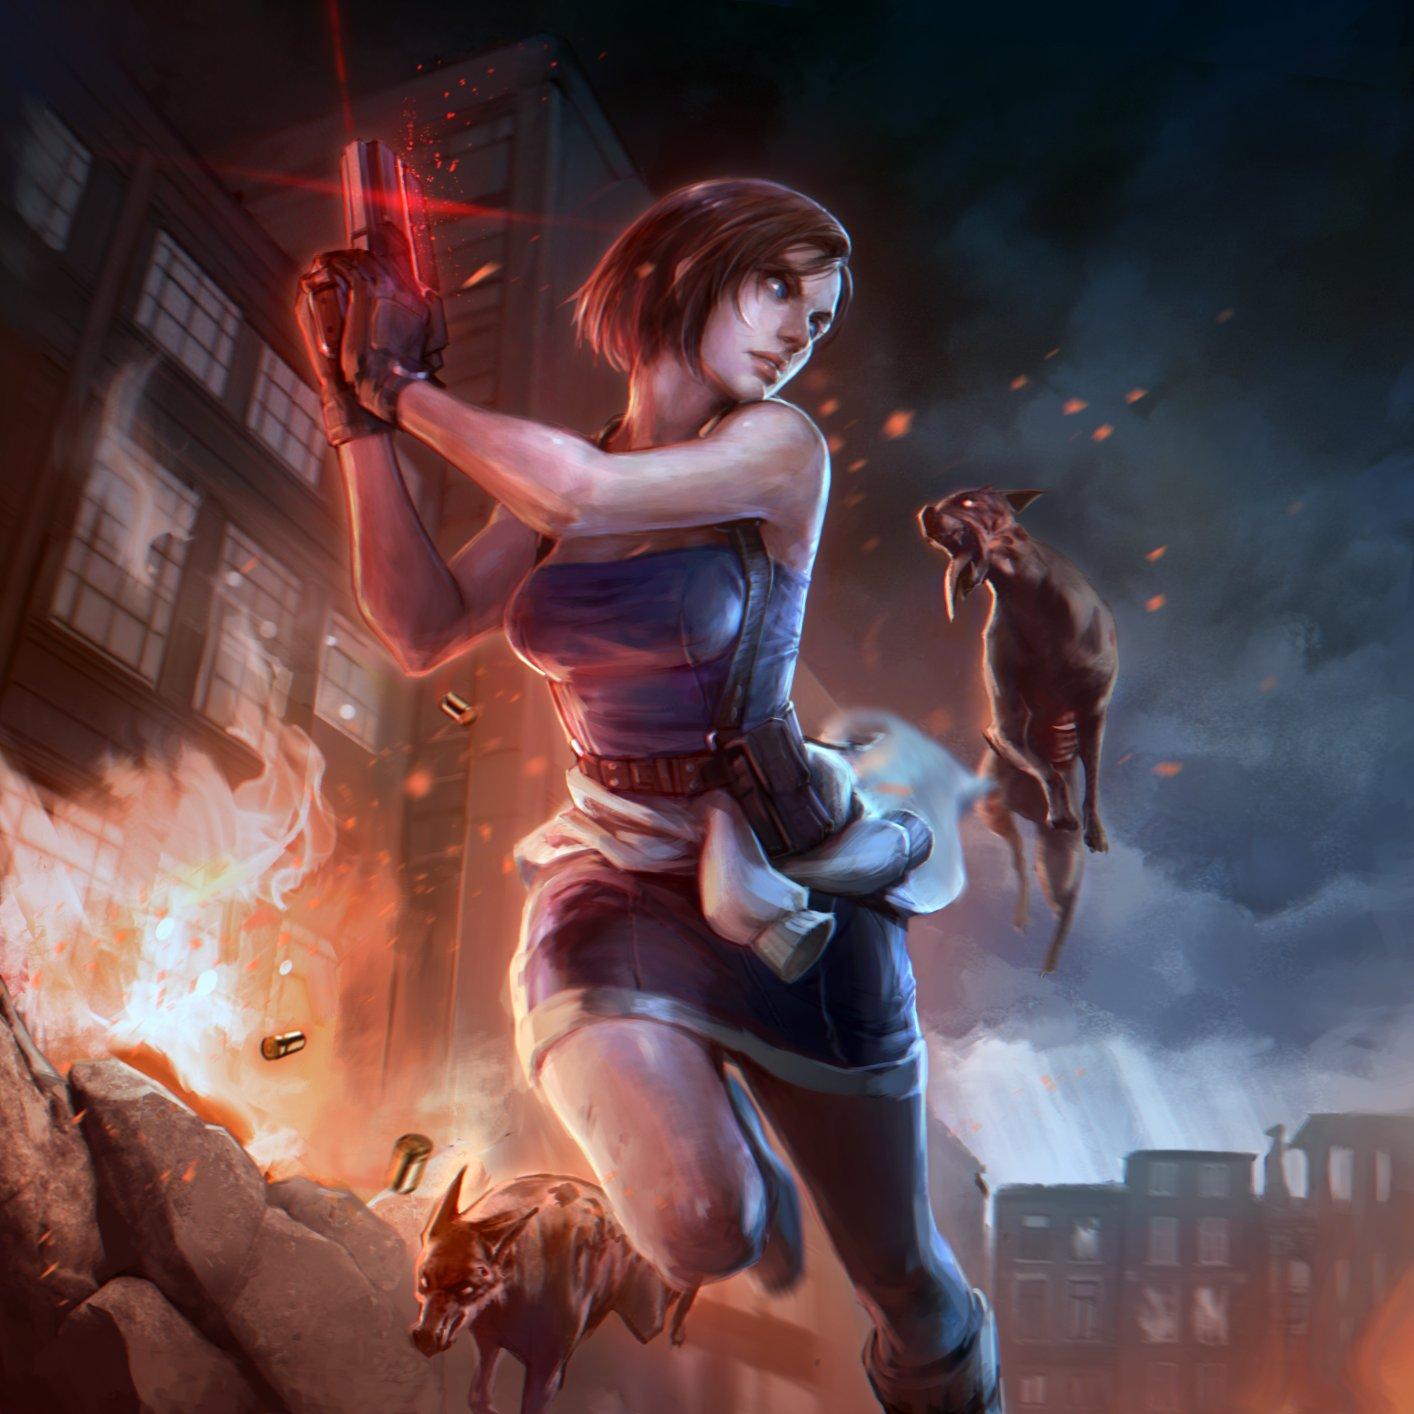 wXboDzOvpz4.jpg - Resident Evil 3: Nemesis Джилл Валентайн